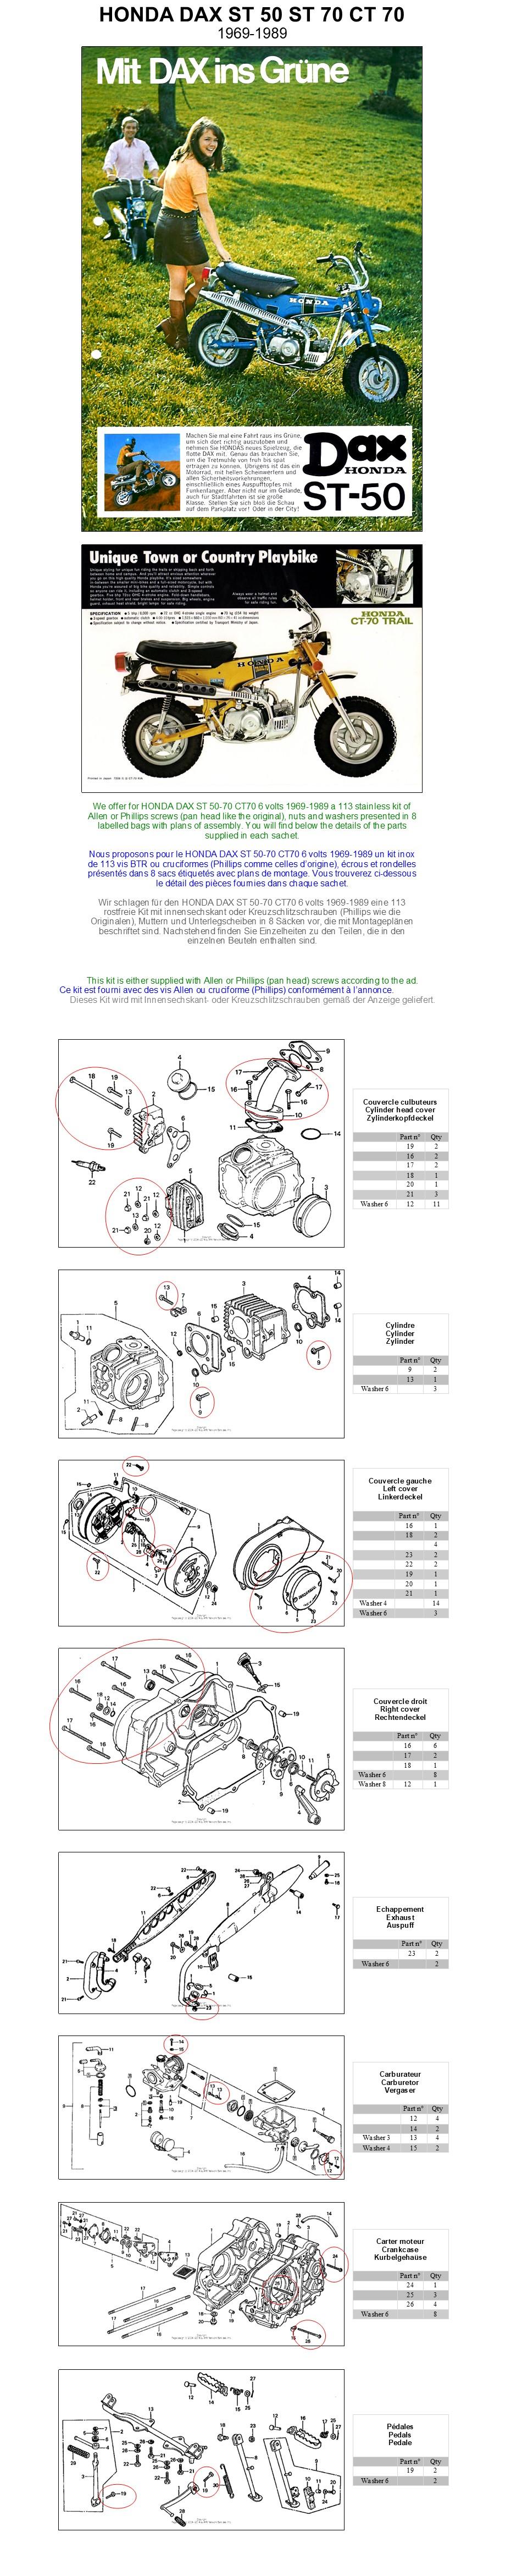 Honda Dax st 50//70 G 6 volts taxe chaîne ouverte NEUF